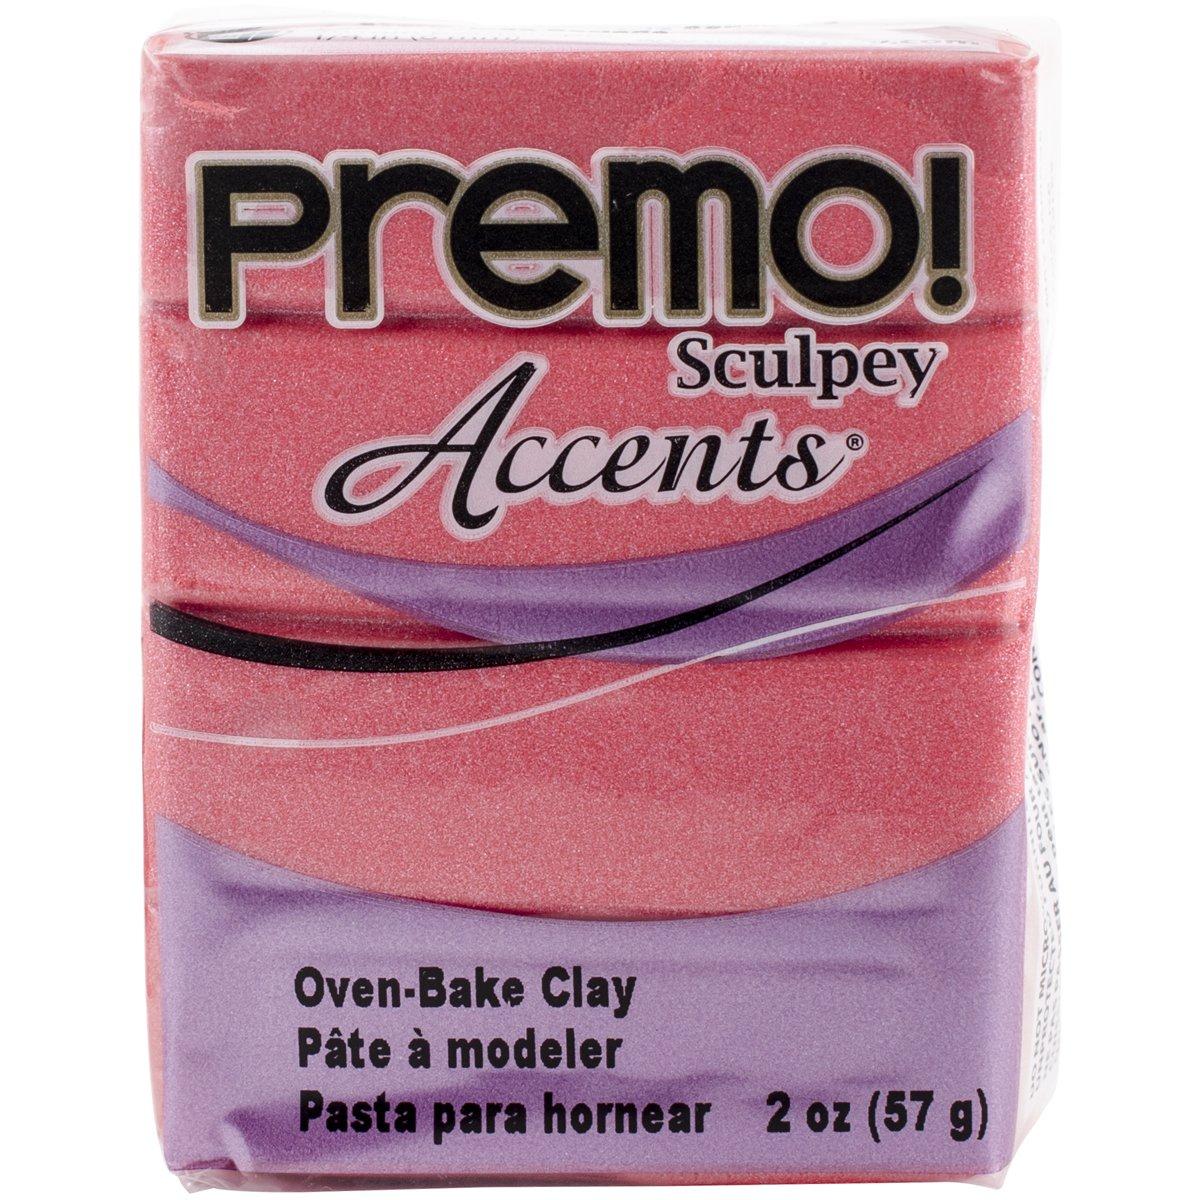 Sculpey Premo Accents Sunset Pearl